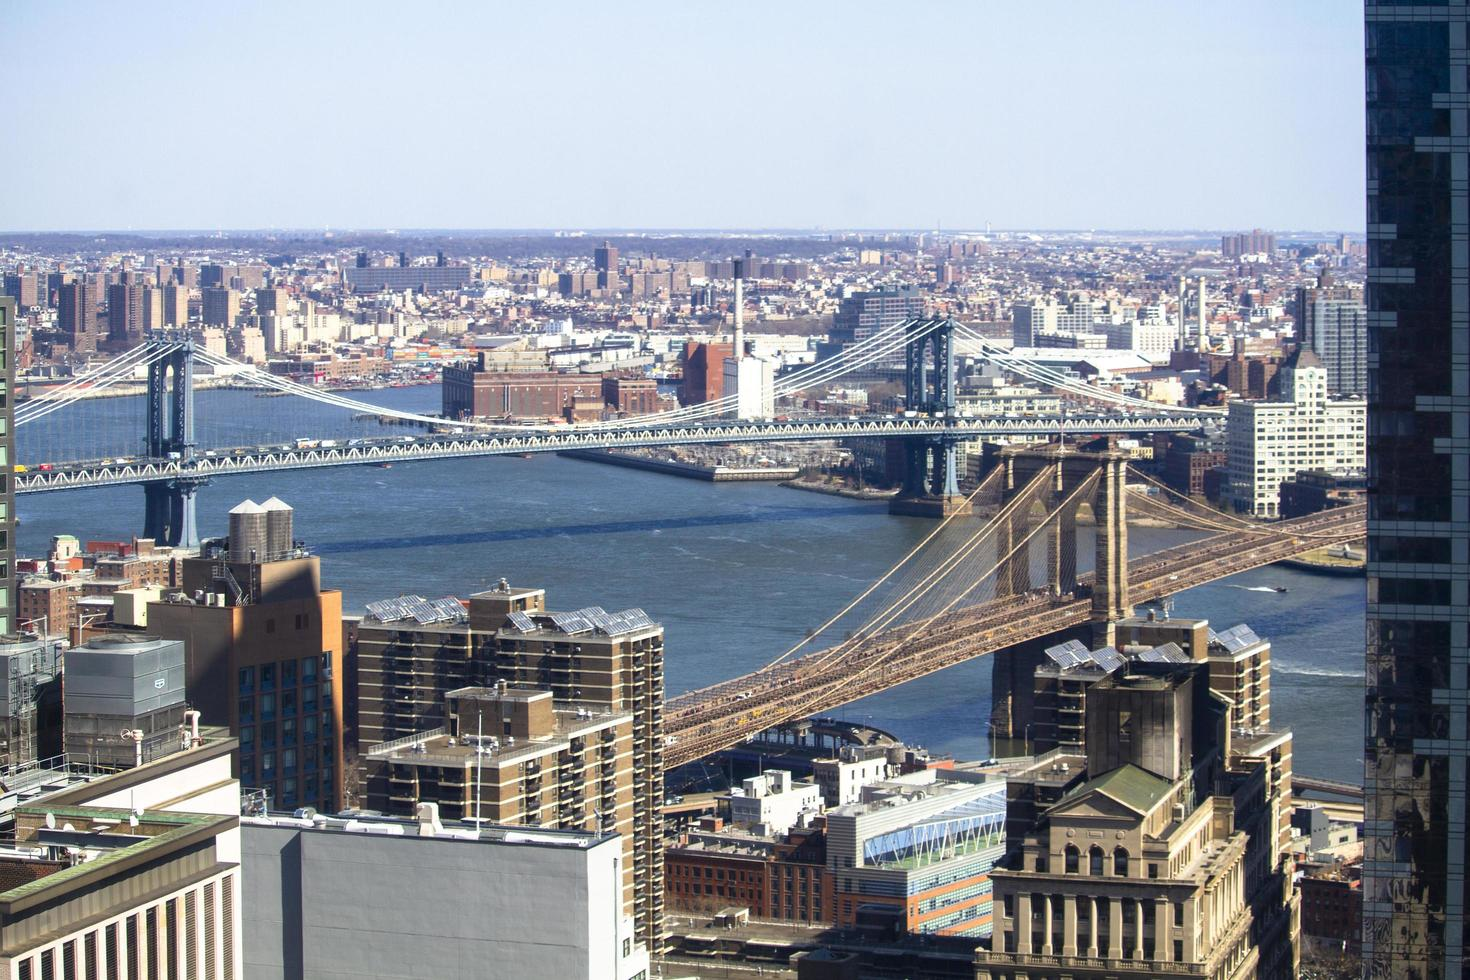 Brooklyn, NY, 2020 - Aerial view of bridges and city photo